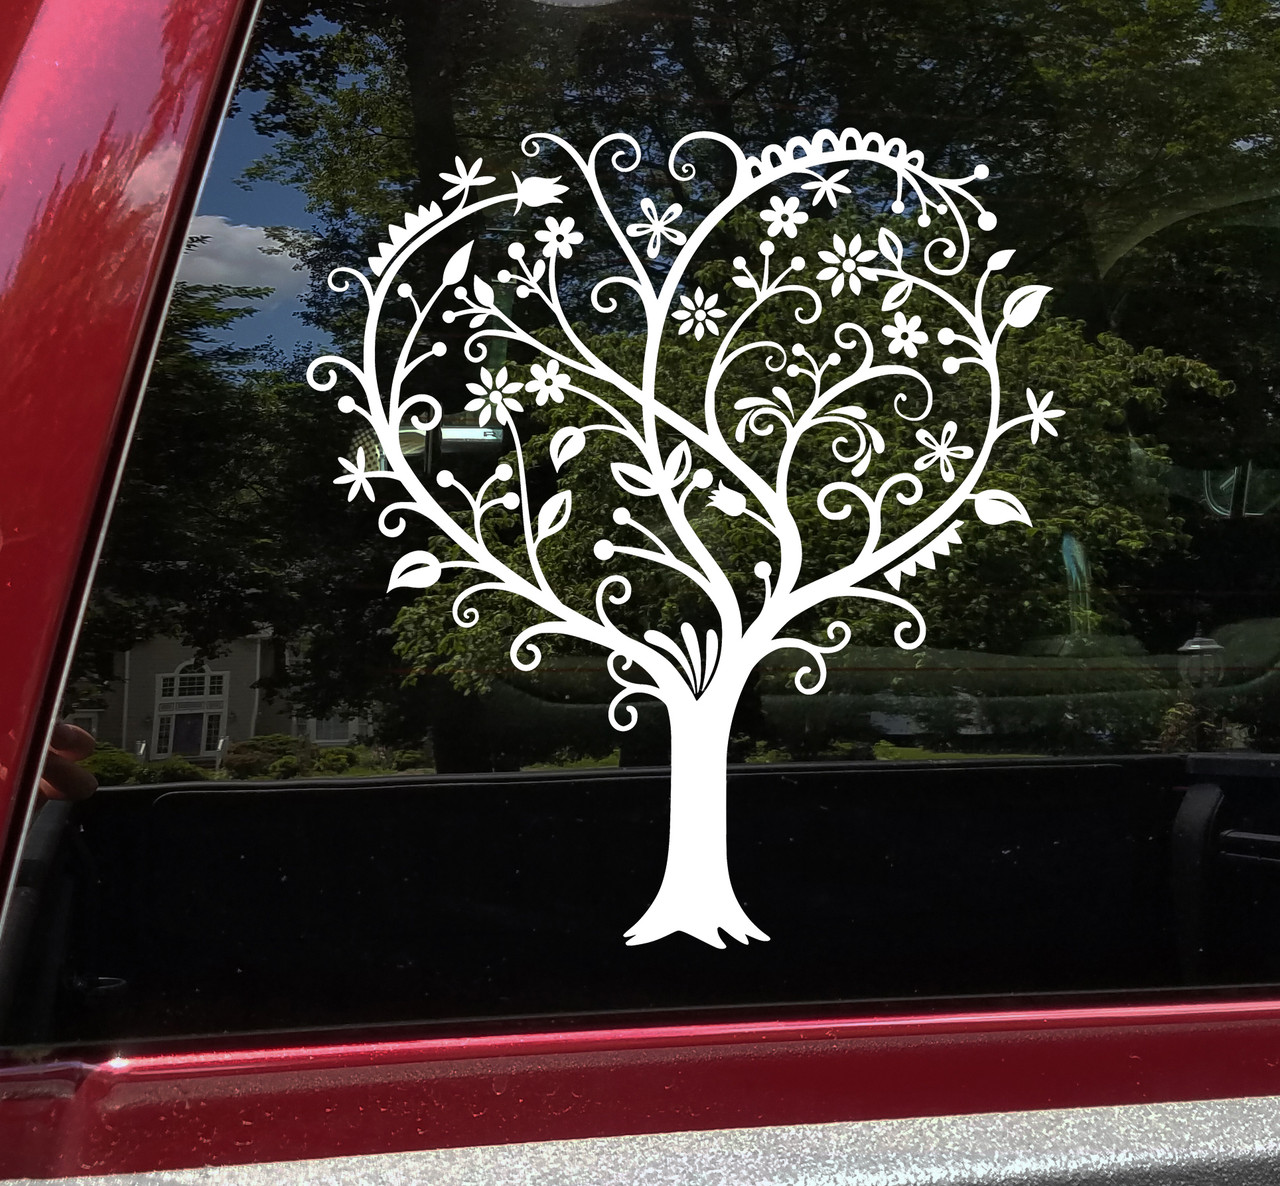 Heart Shaped Tree Vinyl Decal - Love Flowers - Die Cut Sticker